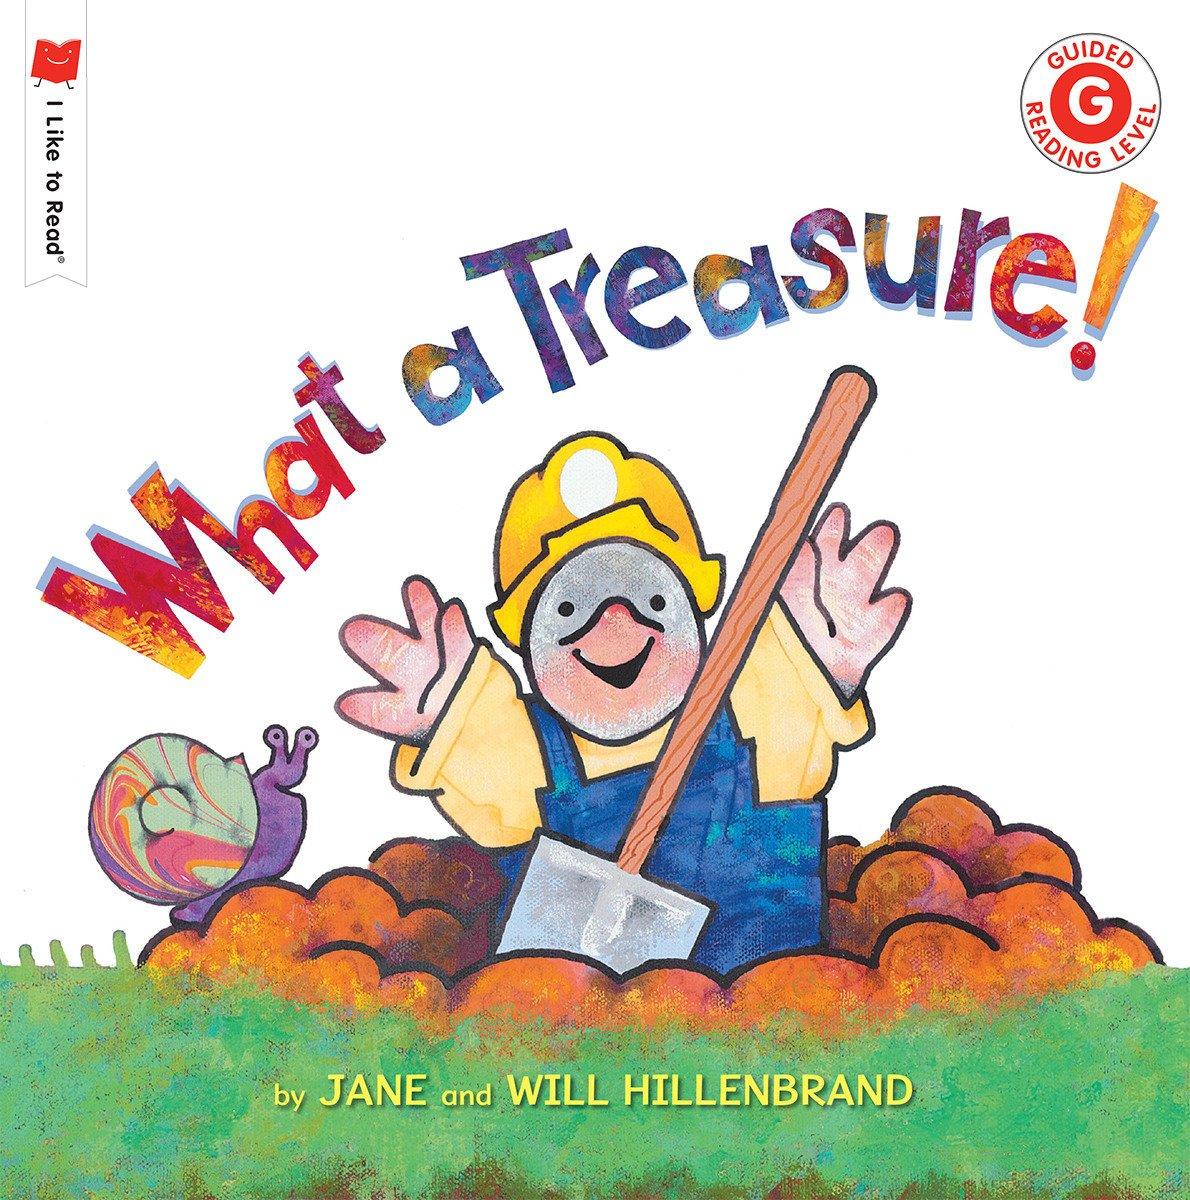 What a Treasure!: Jane Hillenbrand, Will Hillenbrand: 9780823439874: Books  - Amazon.ca